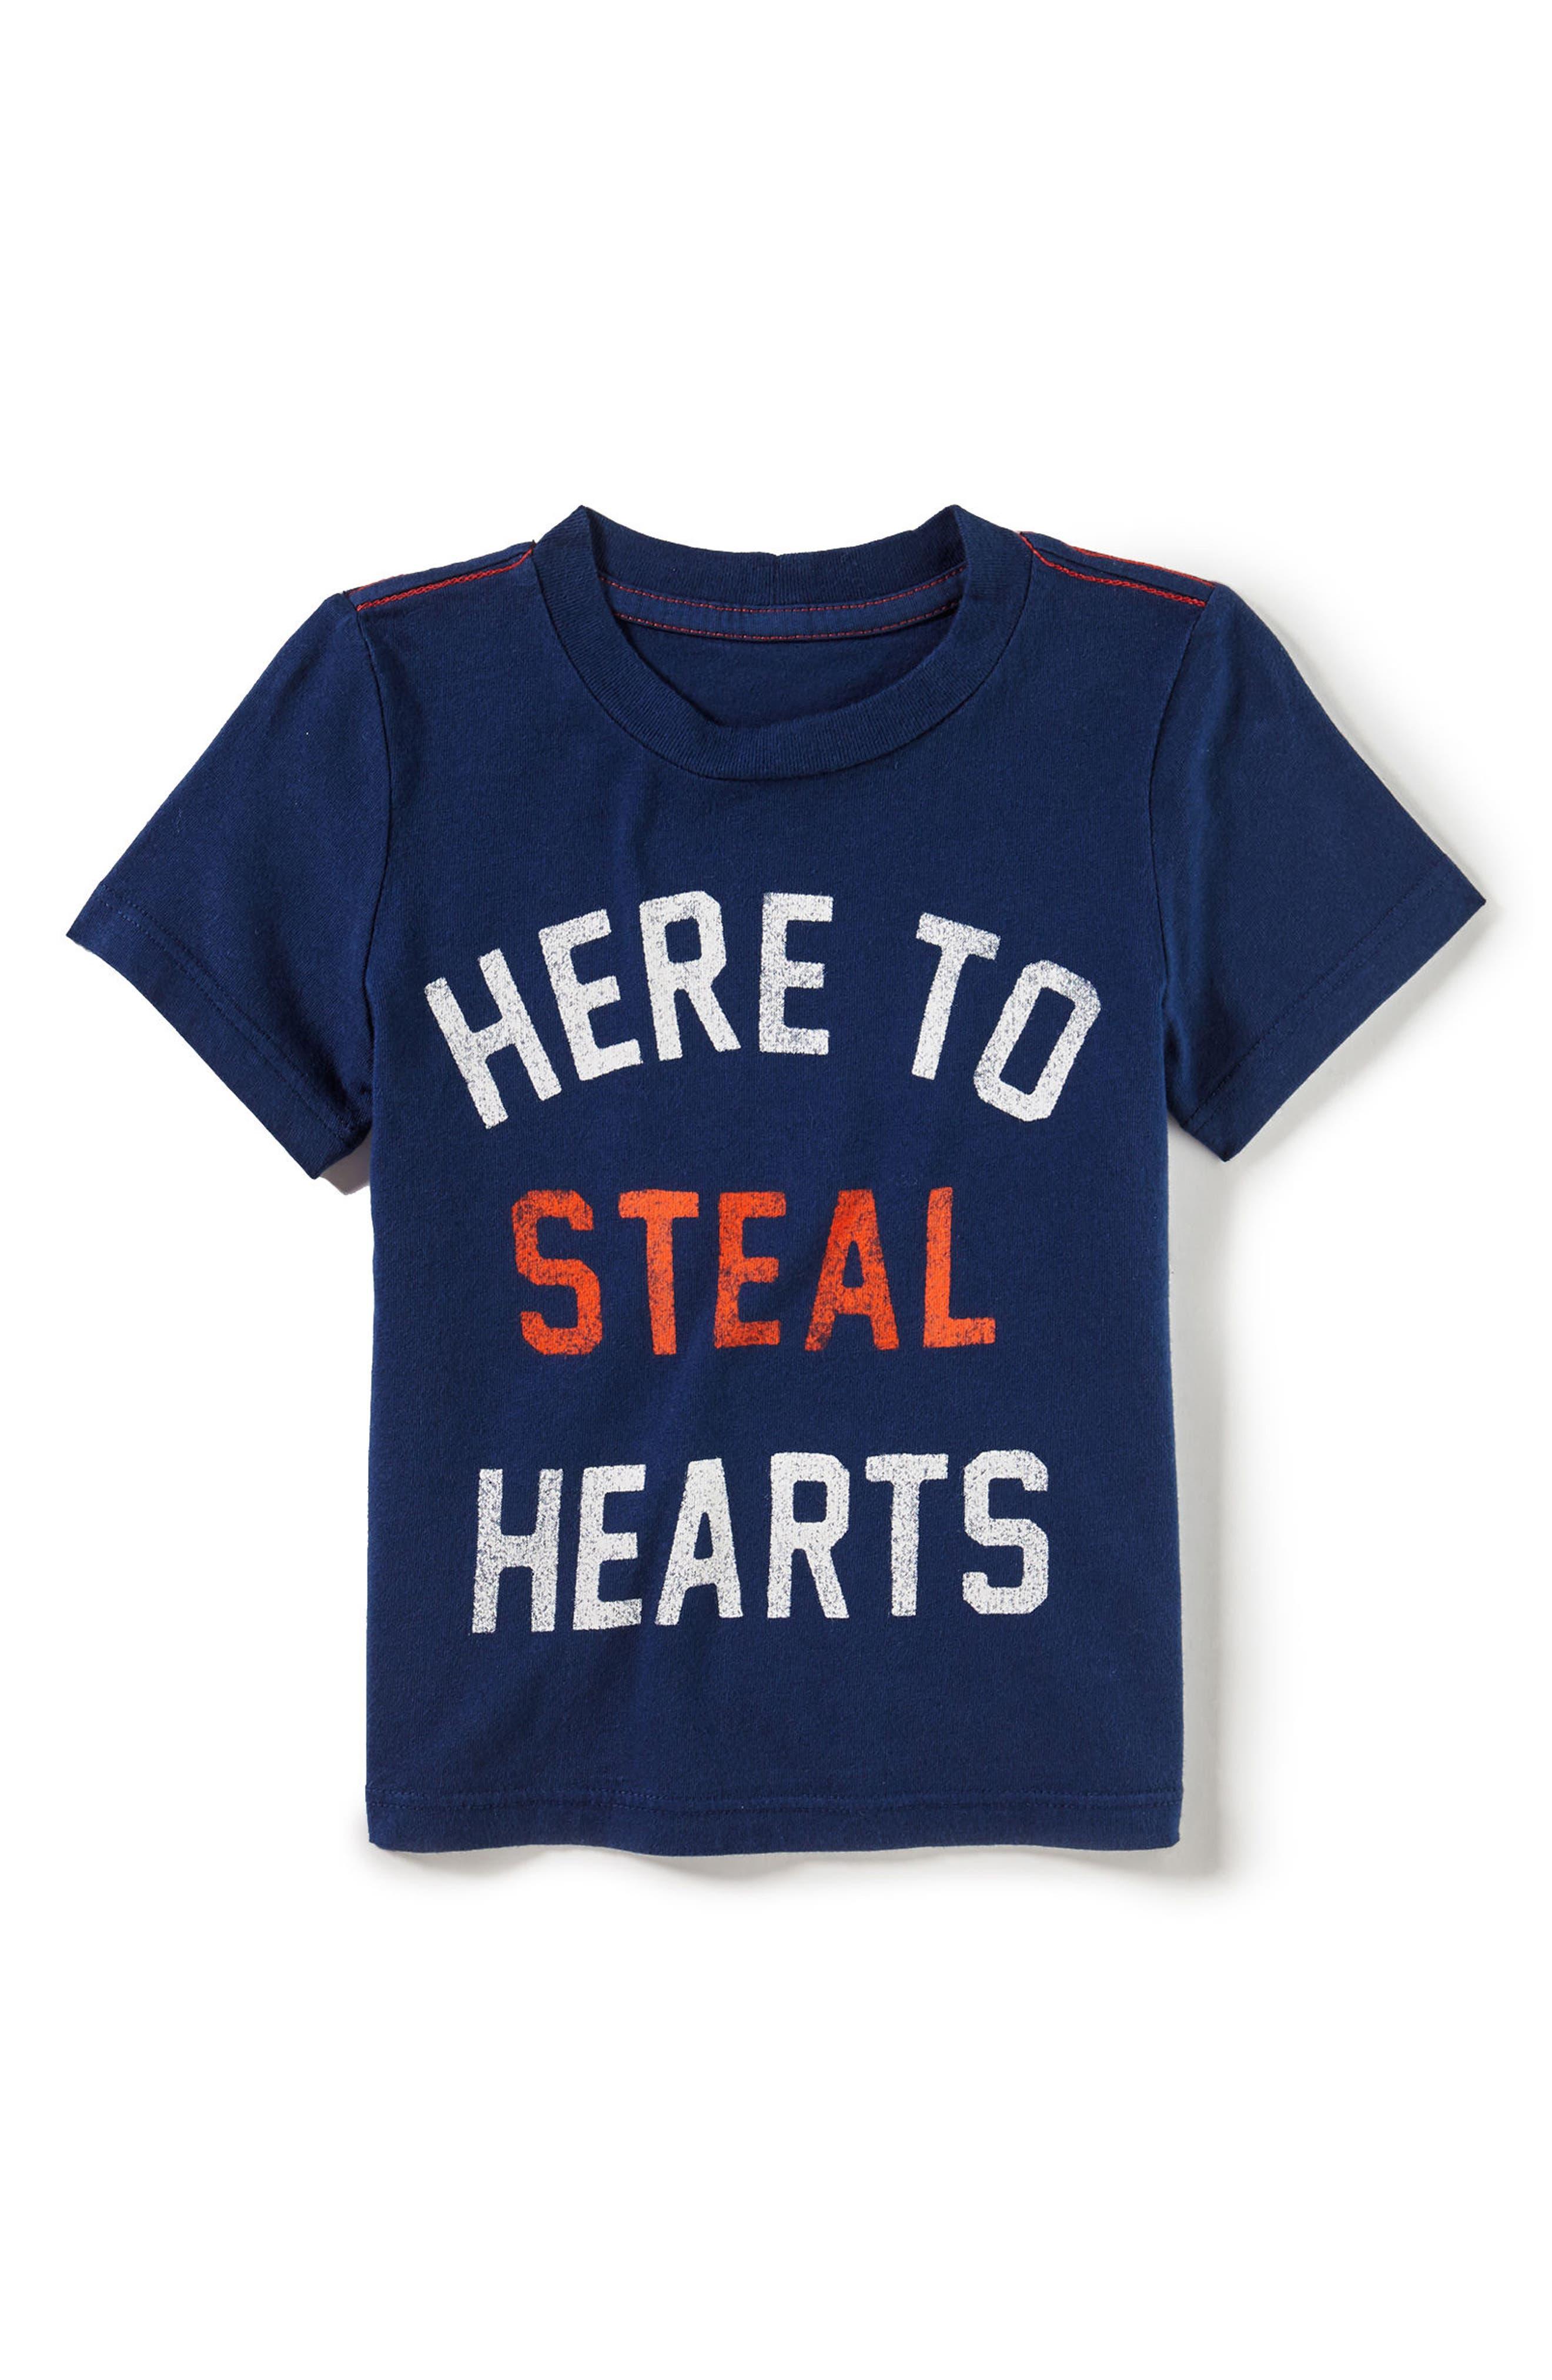 Steal Hearts Graphic T-Shirt,                             Main thumbnail 1, color,                             Navy